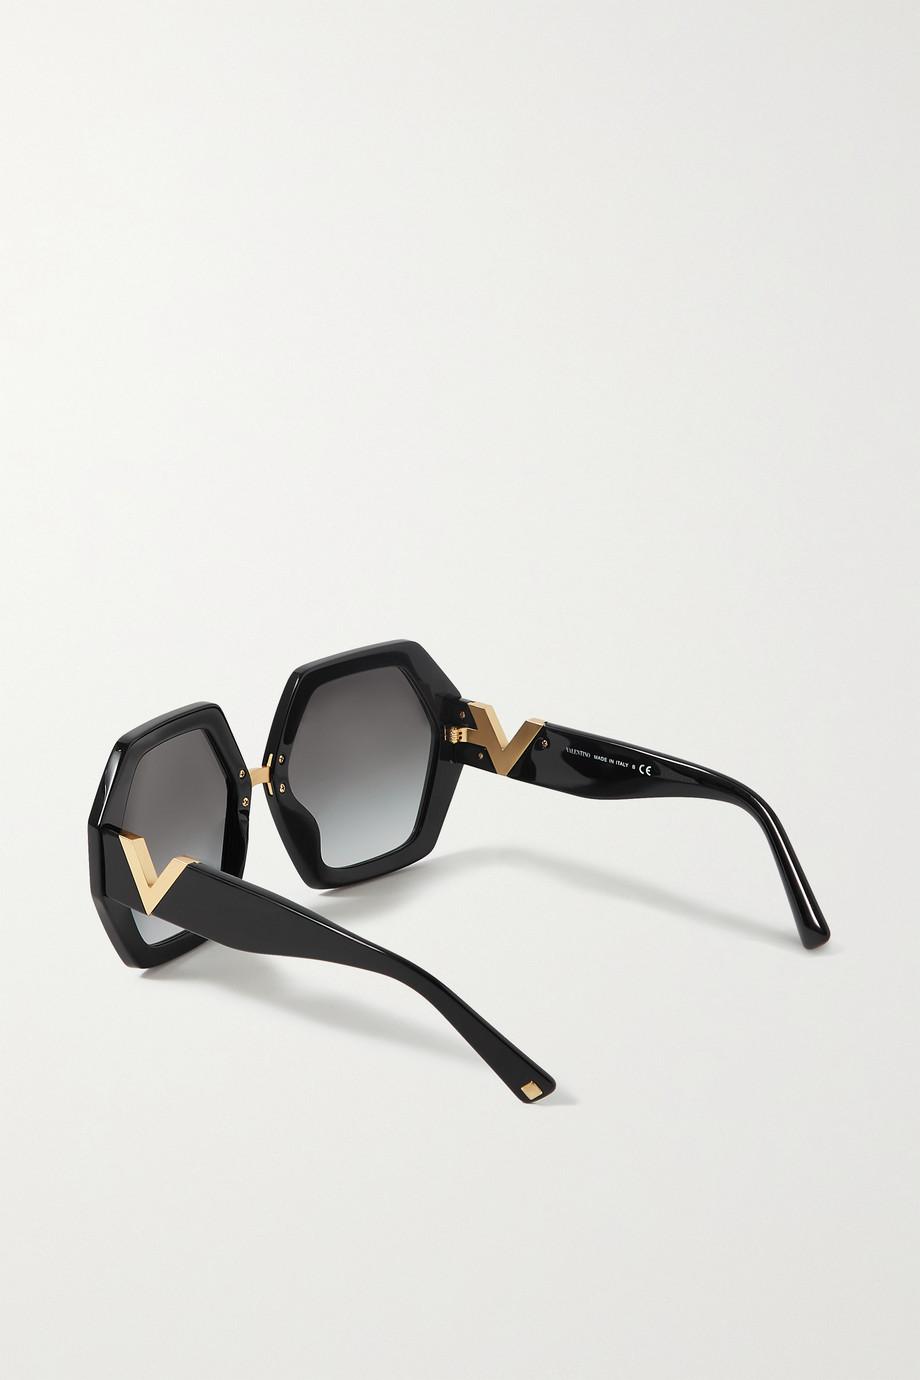 Valentino Valentino Garavani hexagon-frame acetate and gold-tone sunglasses